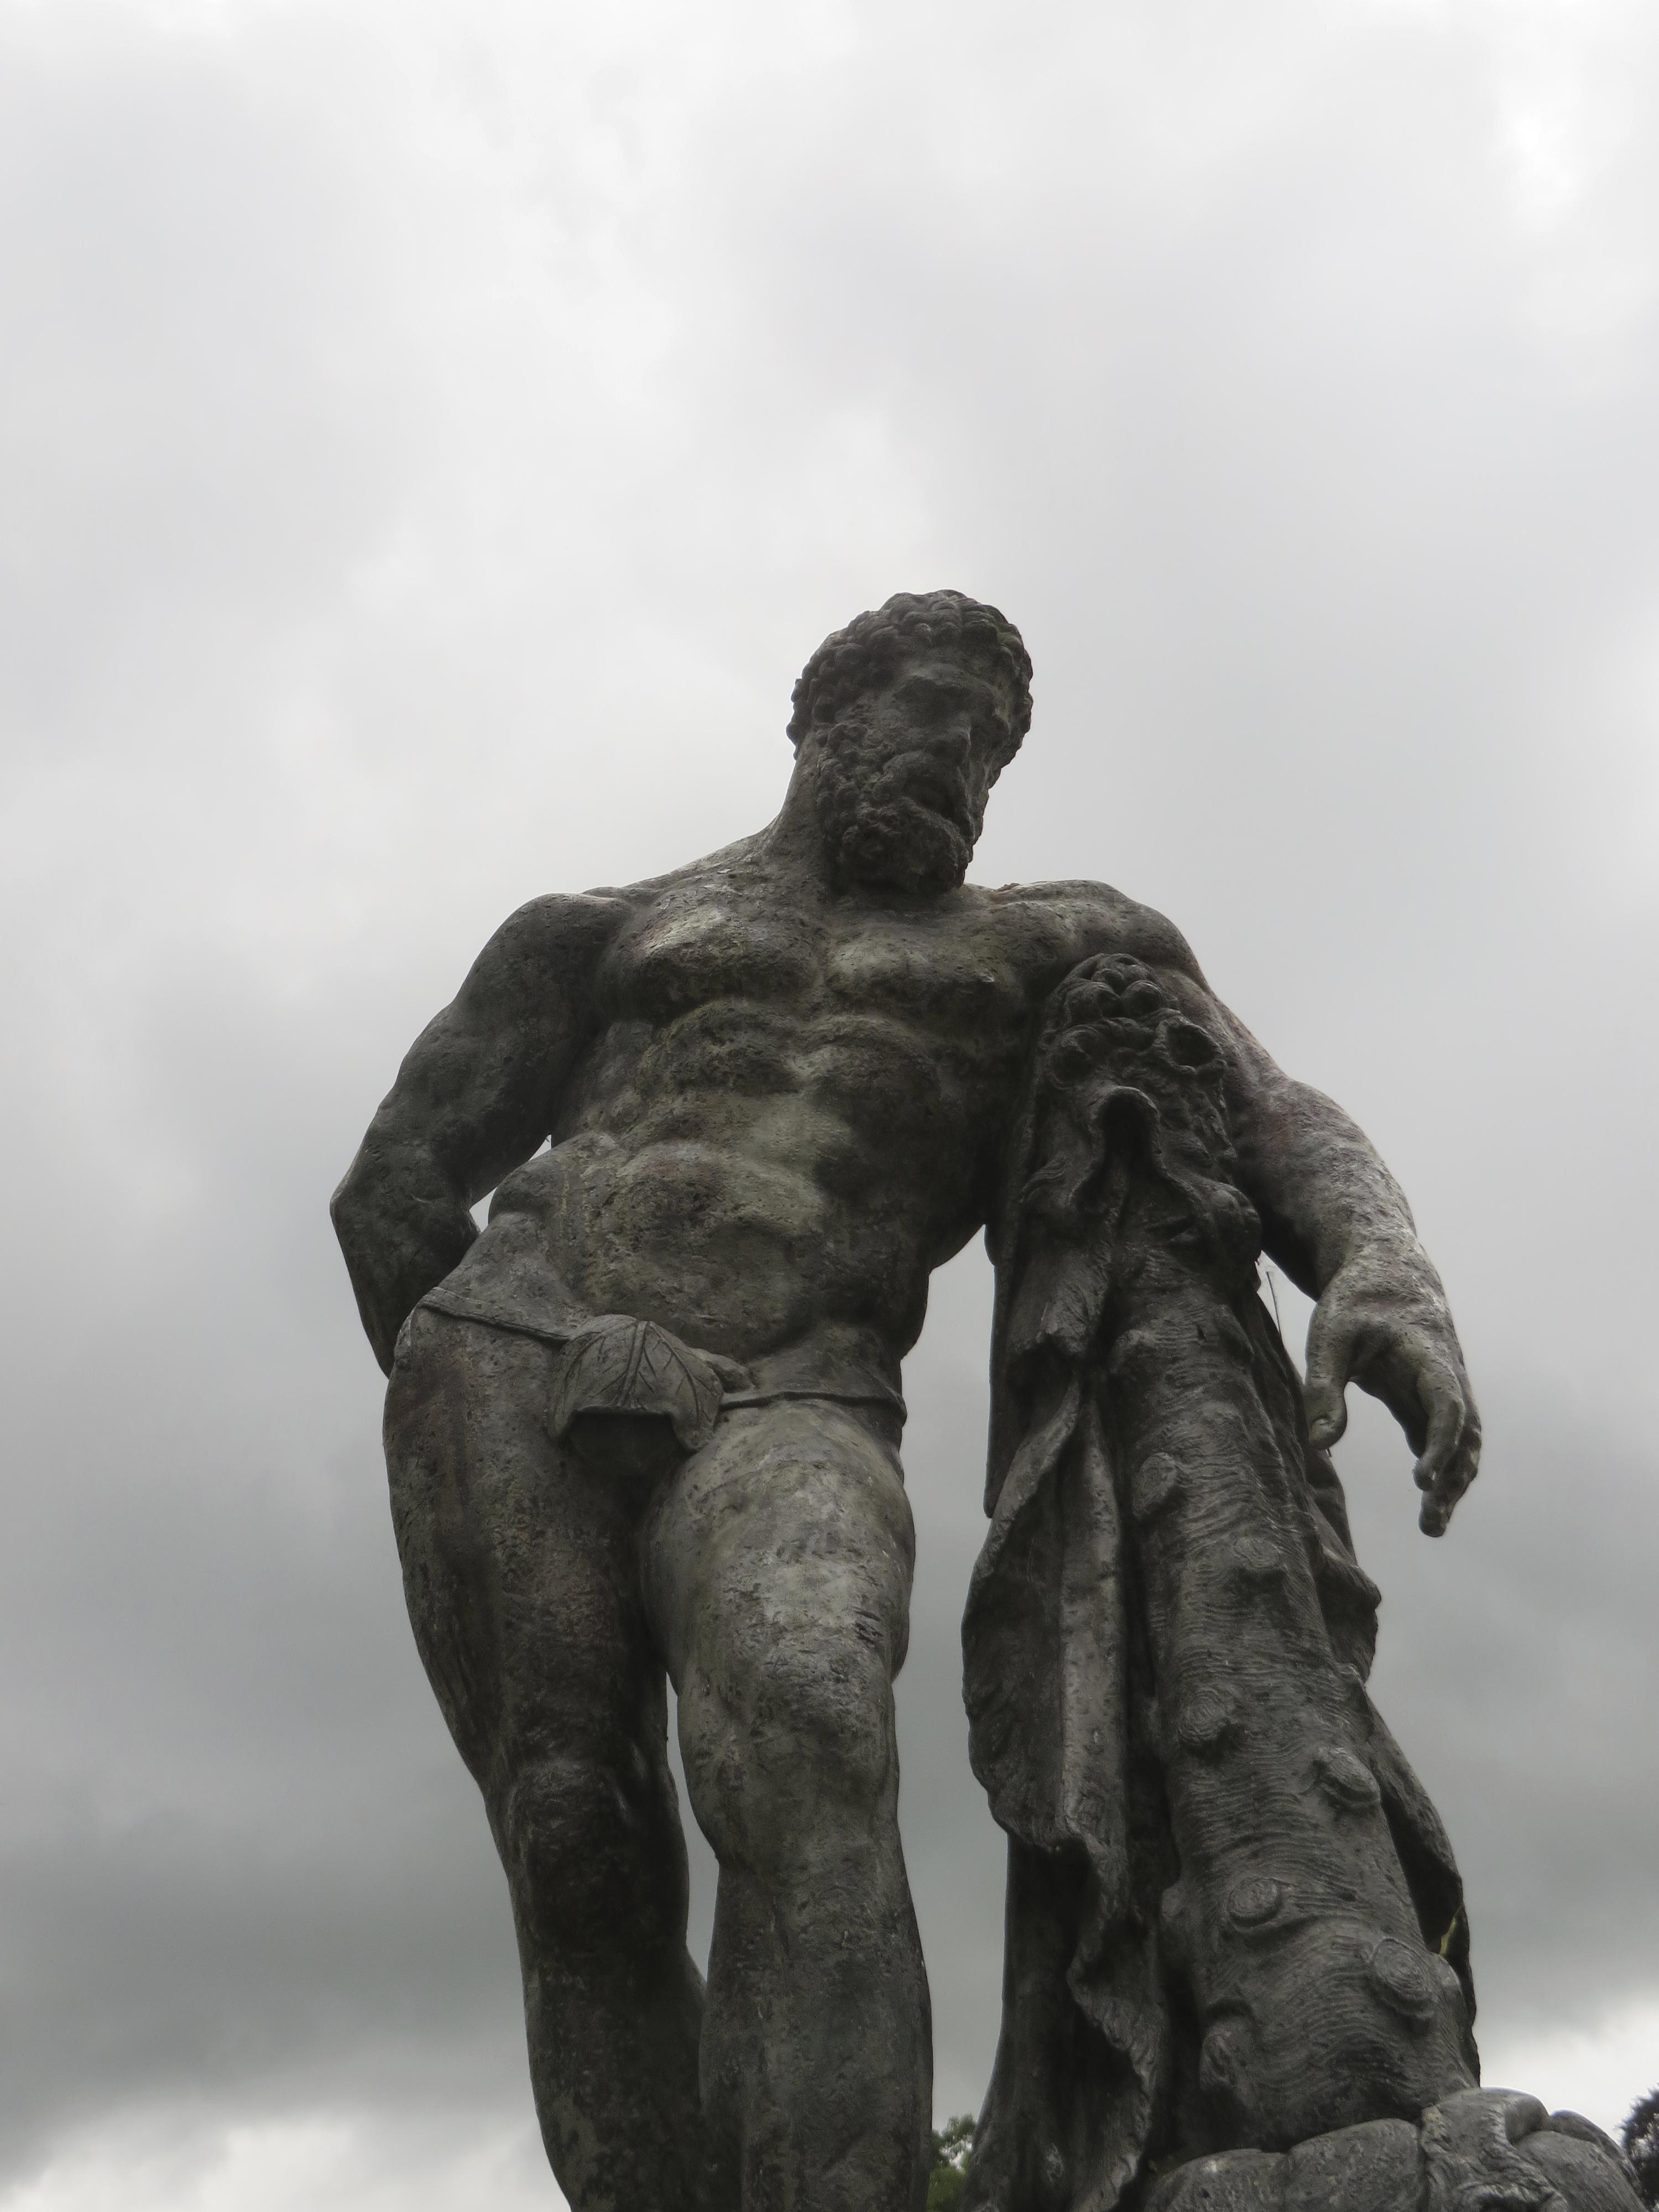 Hercules and his fig leaf